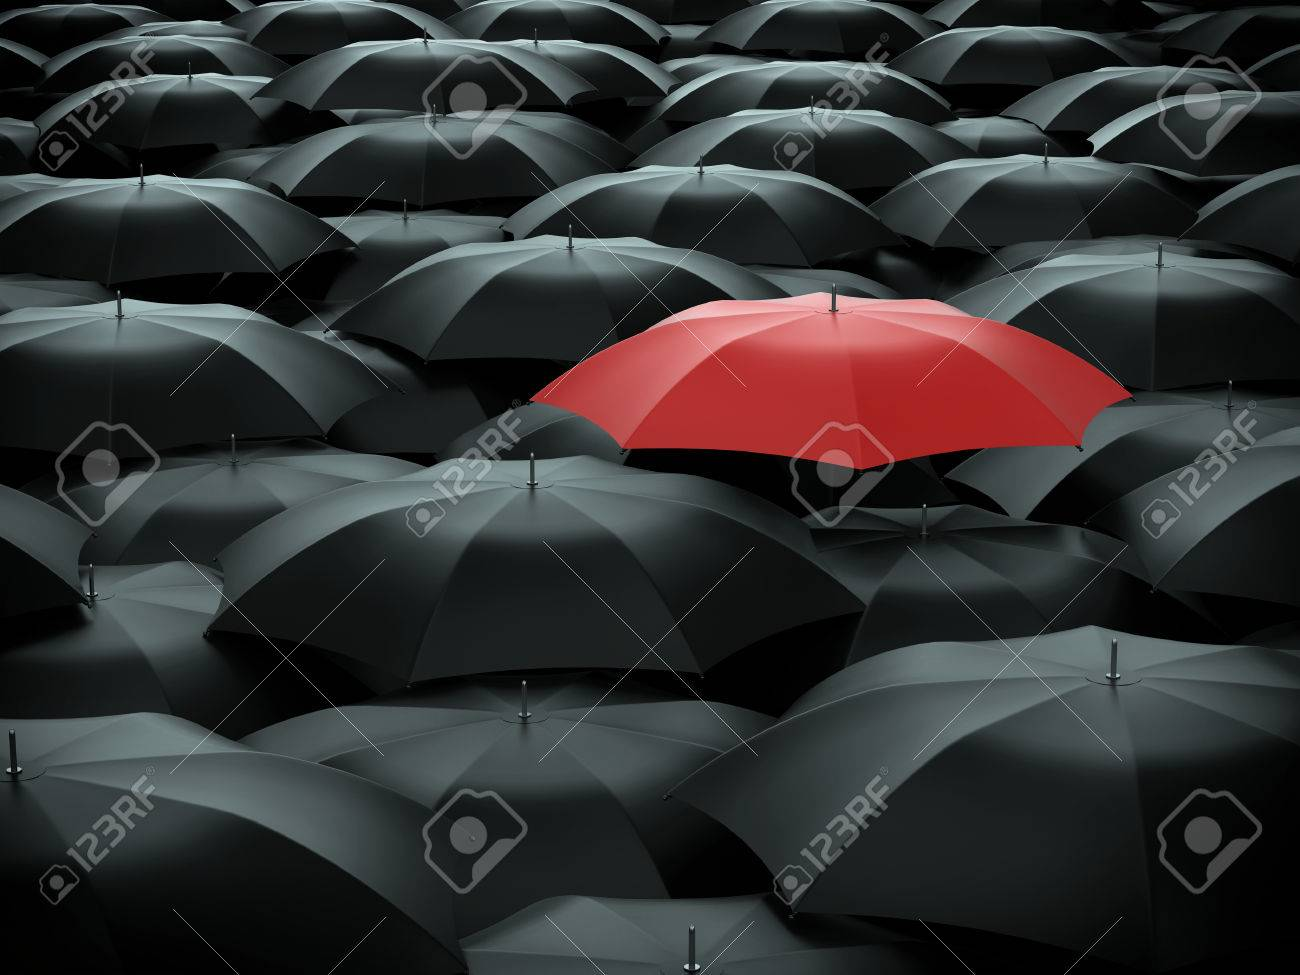 Red umbrella over many black umbrellas - 61991816